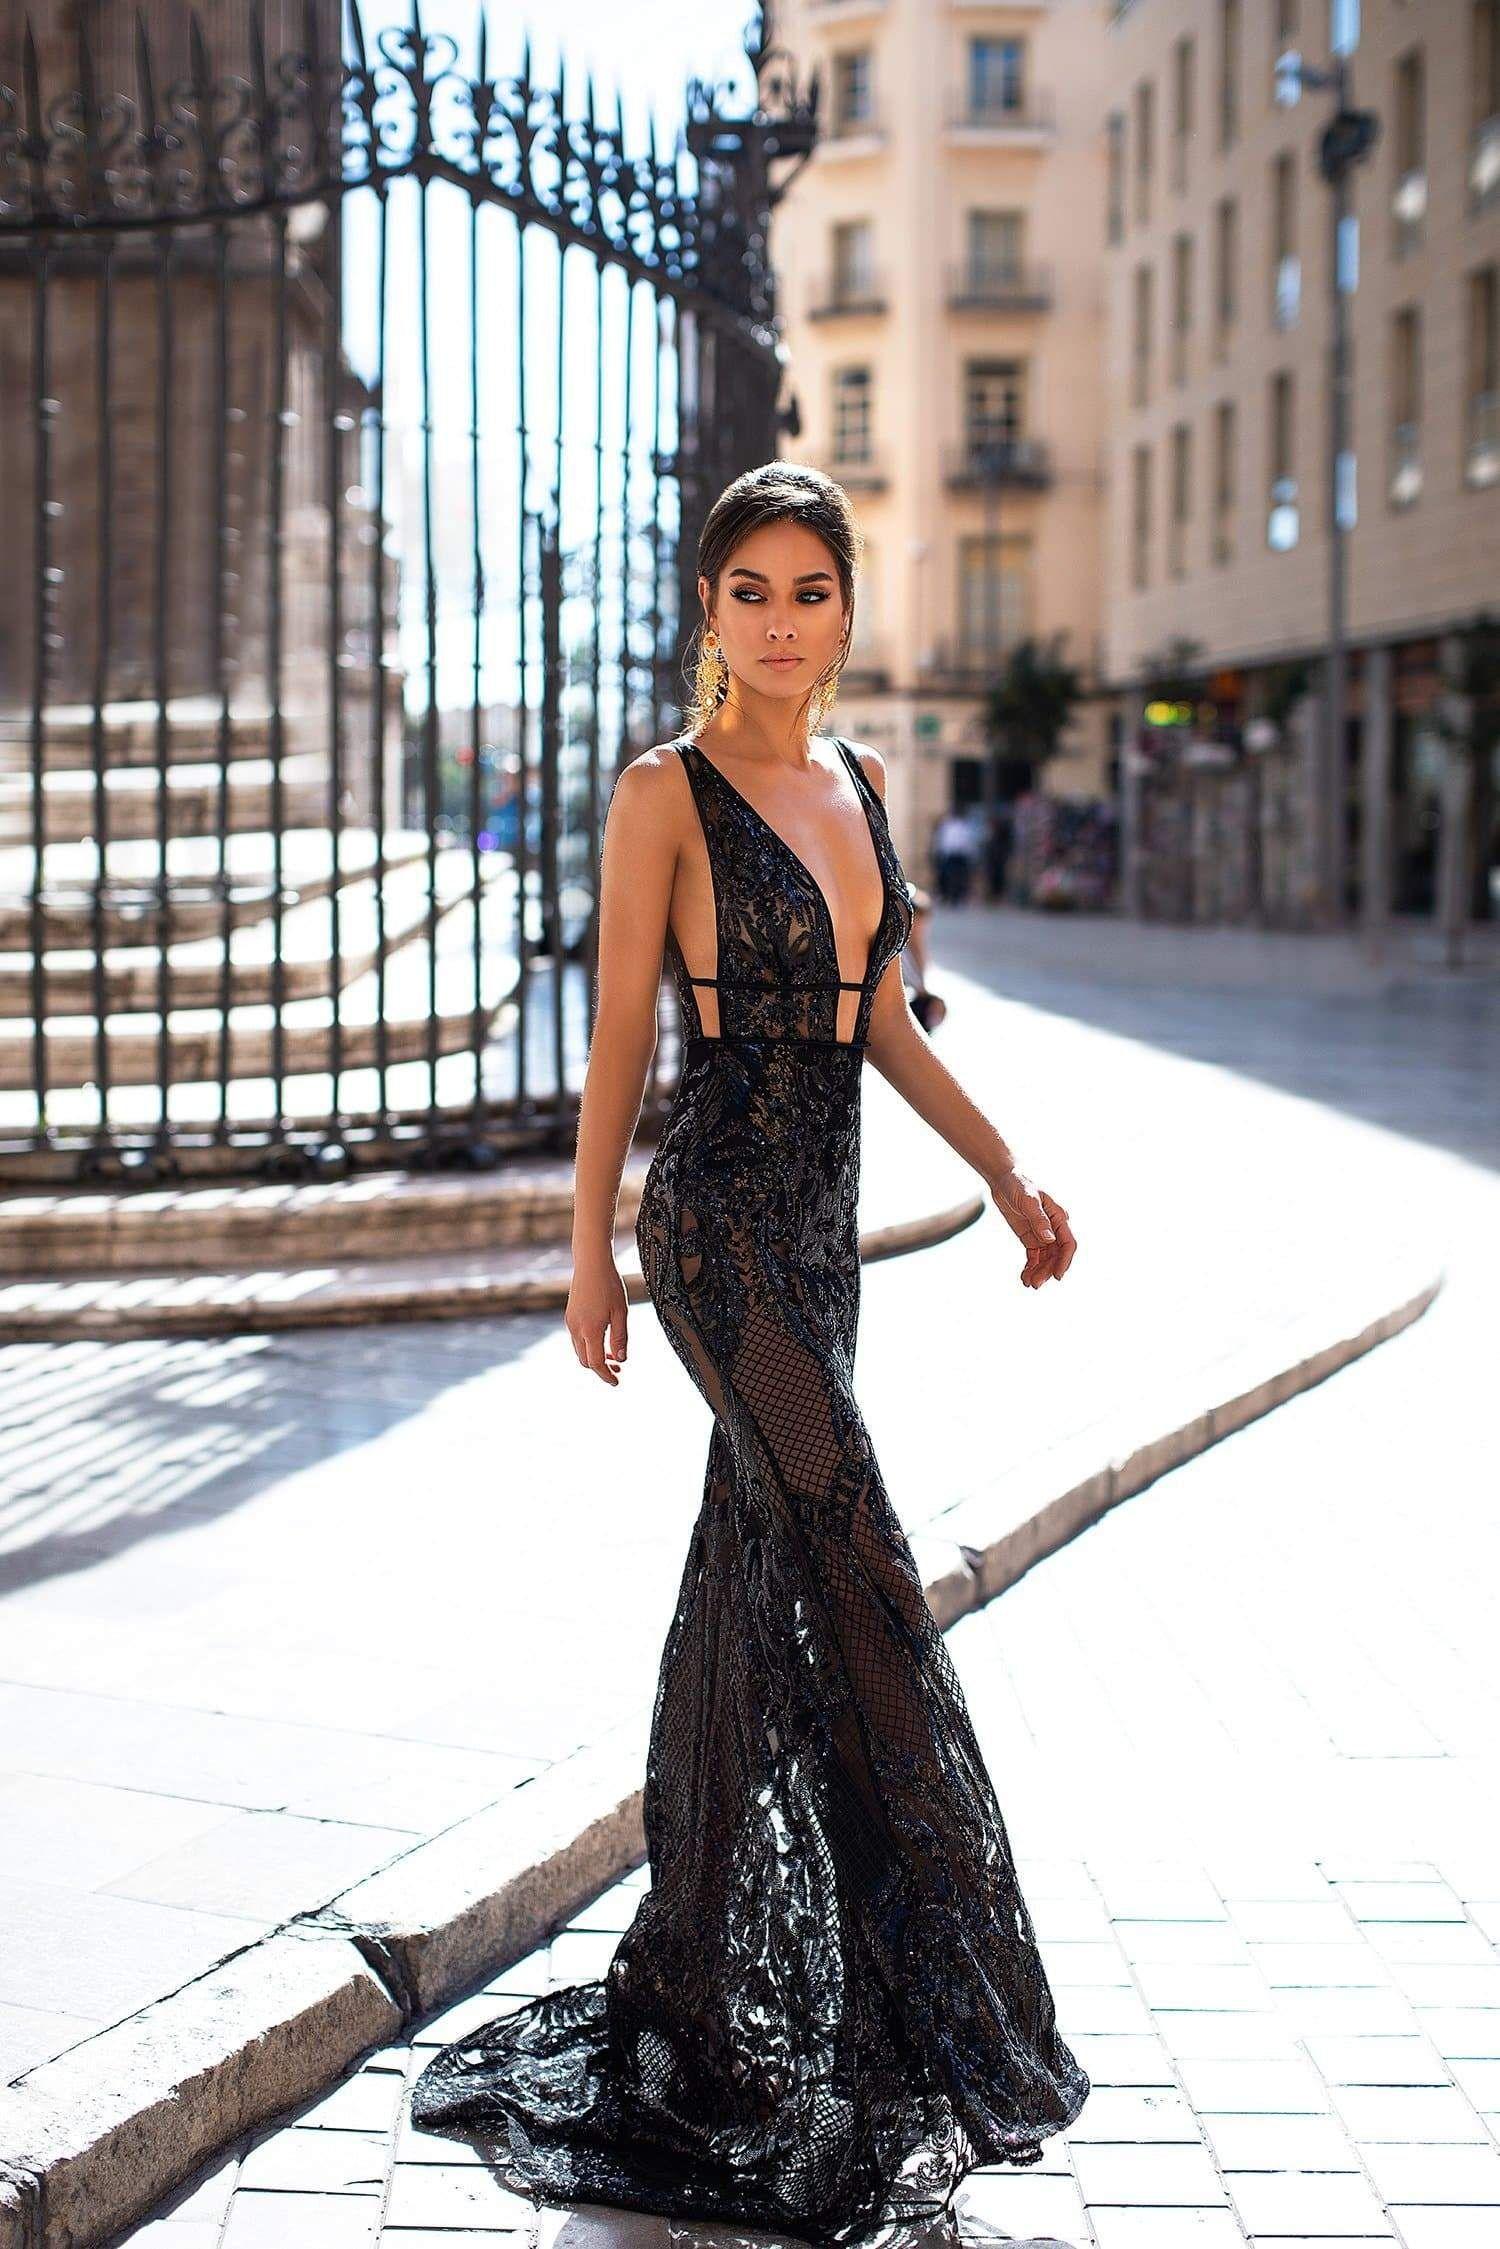 How To Choose The Perfect Little Black Dress Fashion Dresses Dresses For Graduation Ceremony [ 1199 x 737 Pixel ]